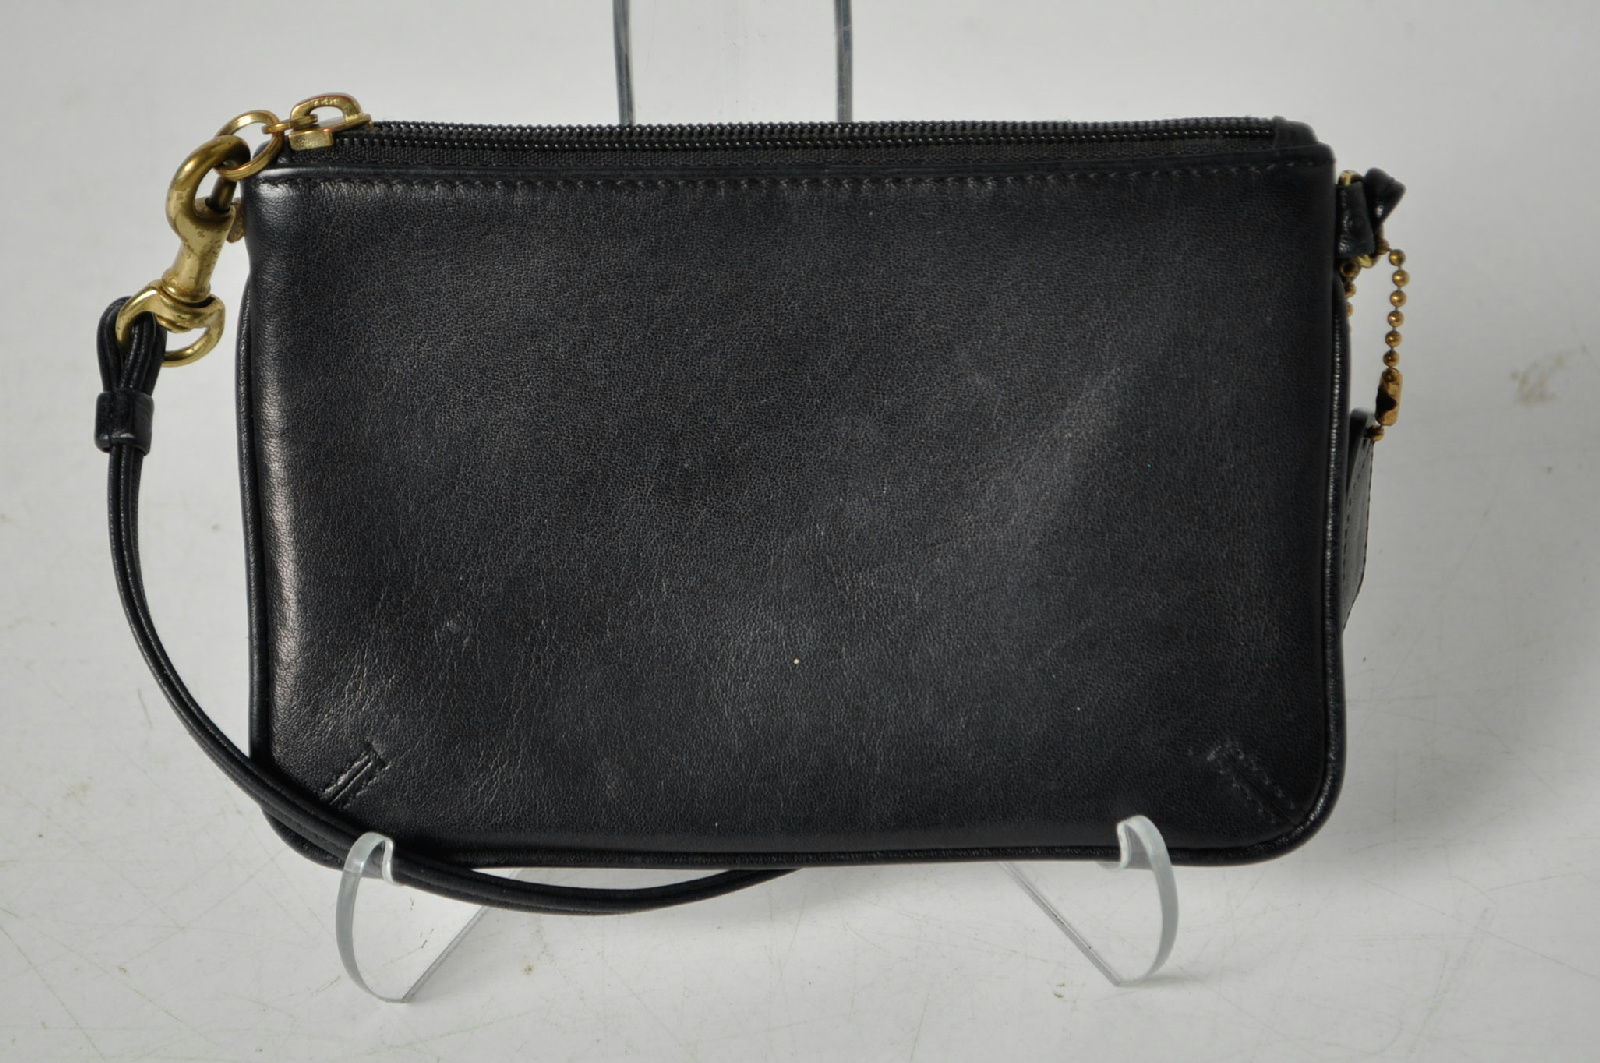 Coach Black Zipper Mini Wristlet Bag   eBay